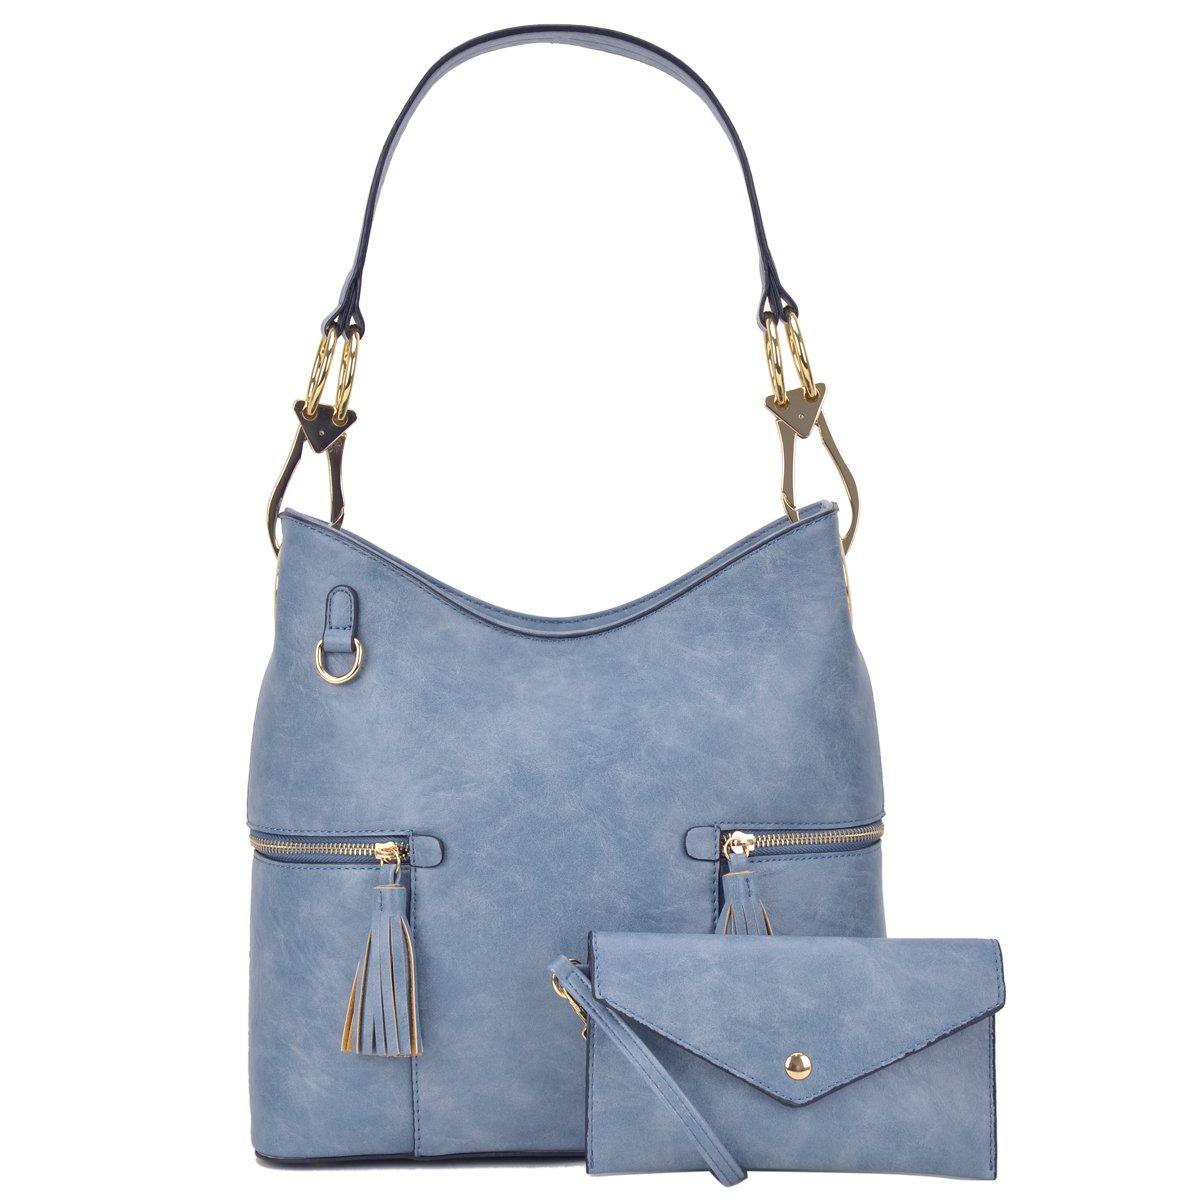 Classic Large Hobo Shoulder Bag Women Tote Purse Ladies Handbag PU Leather Big Snap Hook Denim Blue